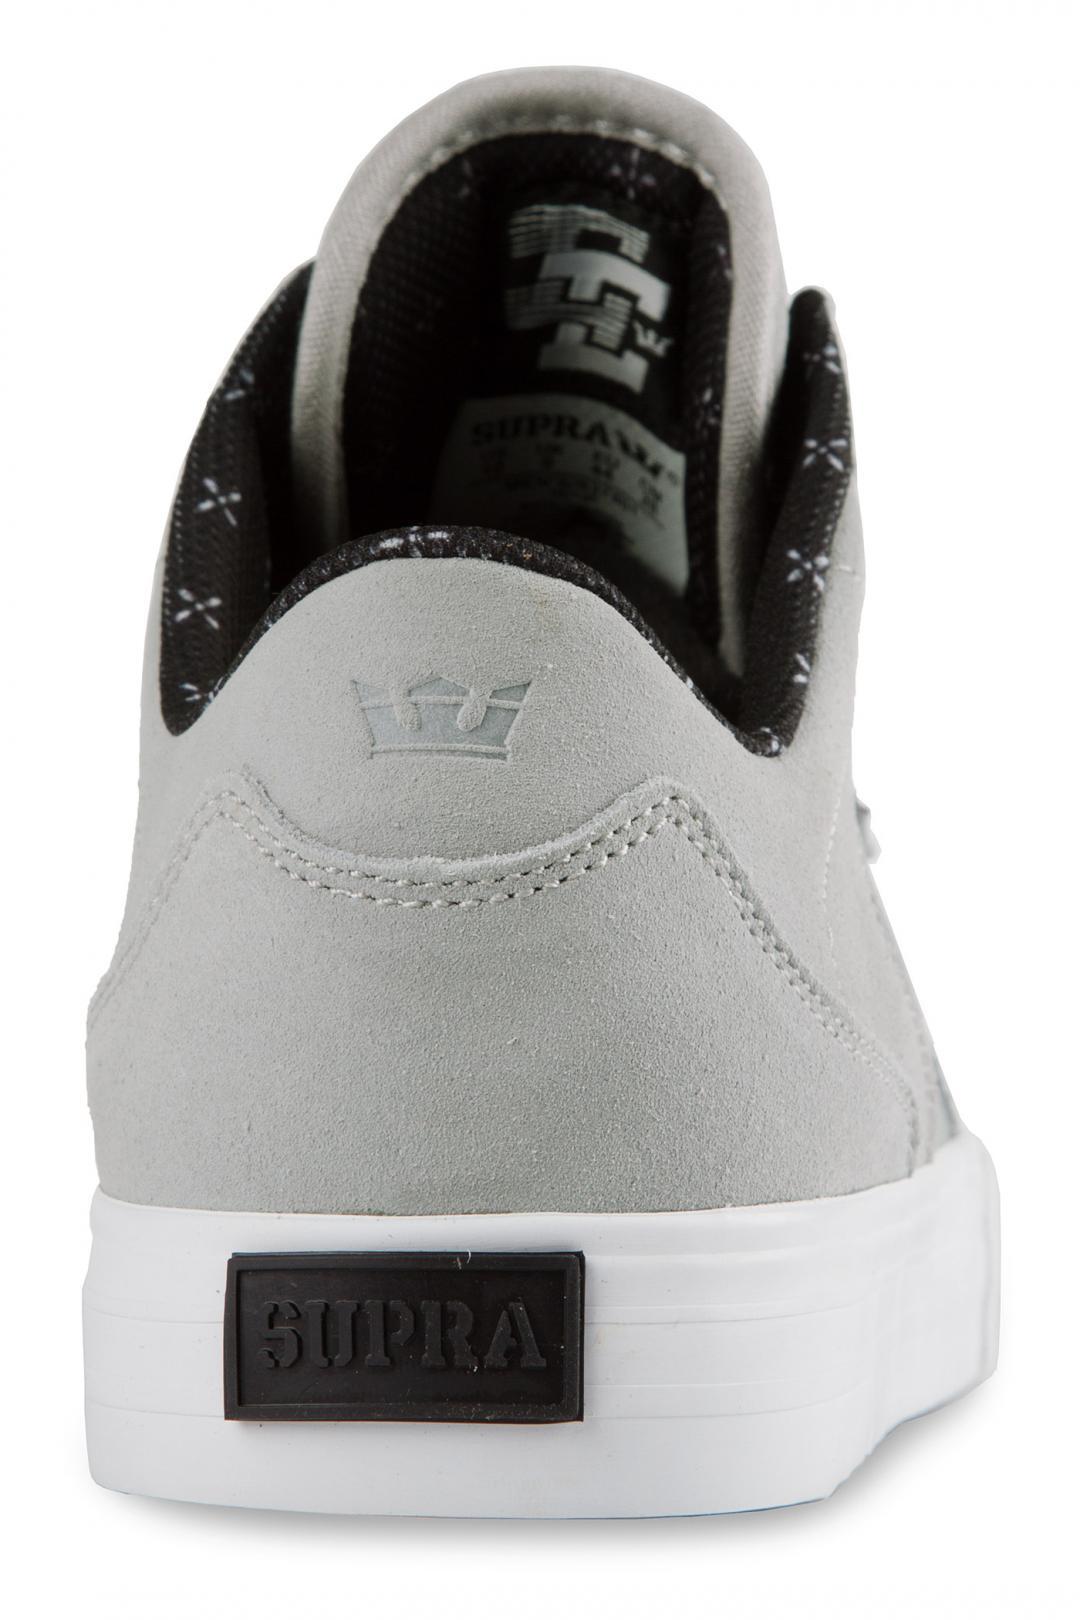 Uomo Supra Ellington Vulc lightgrey off white   Sneakers low top